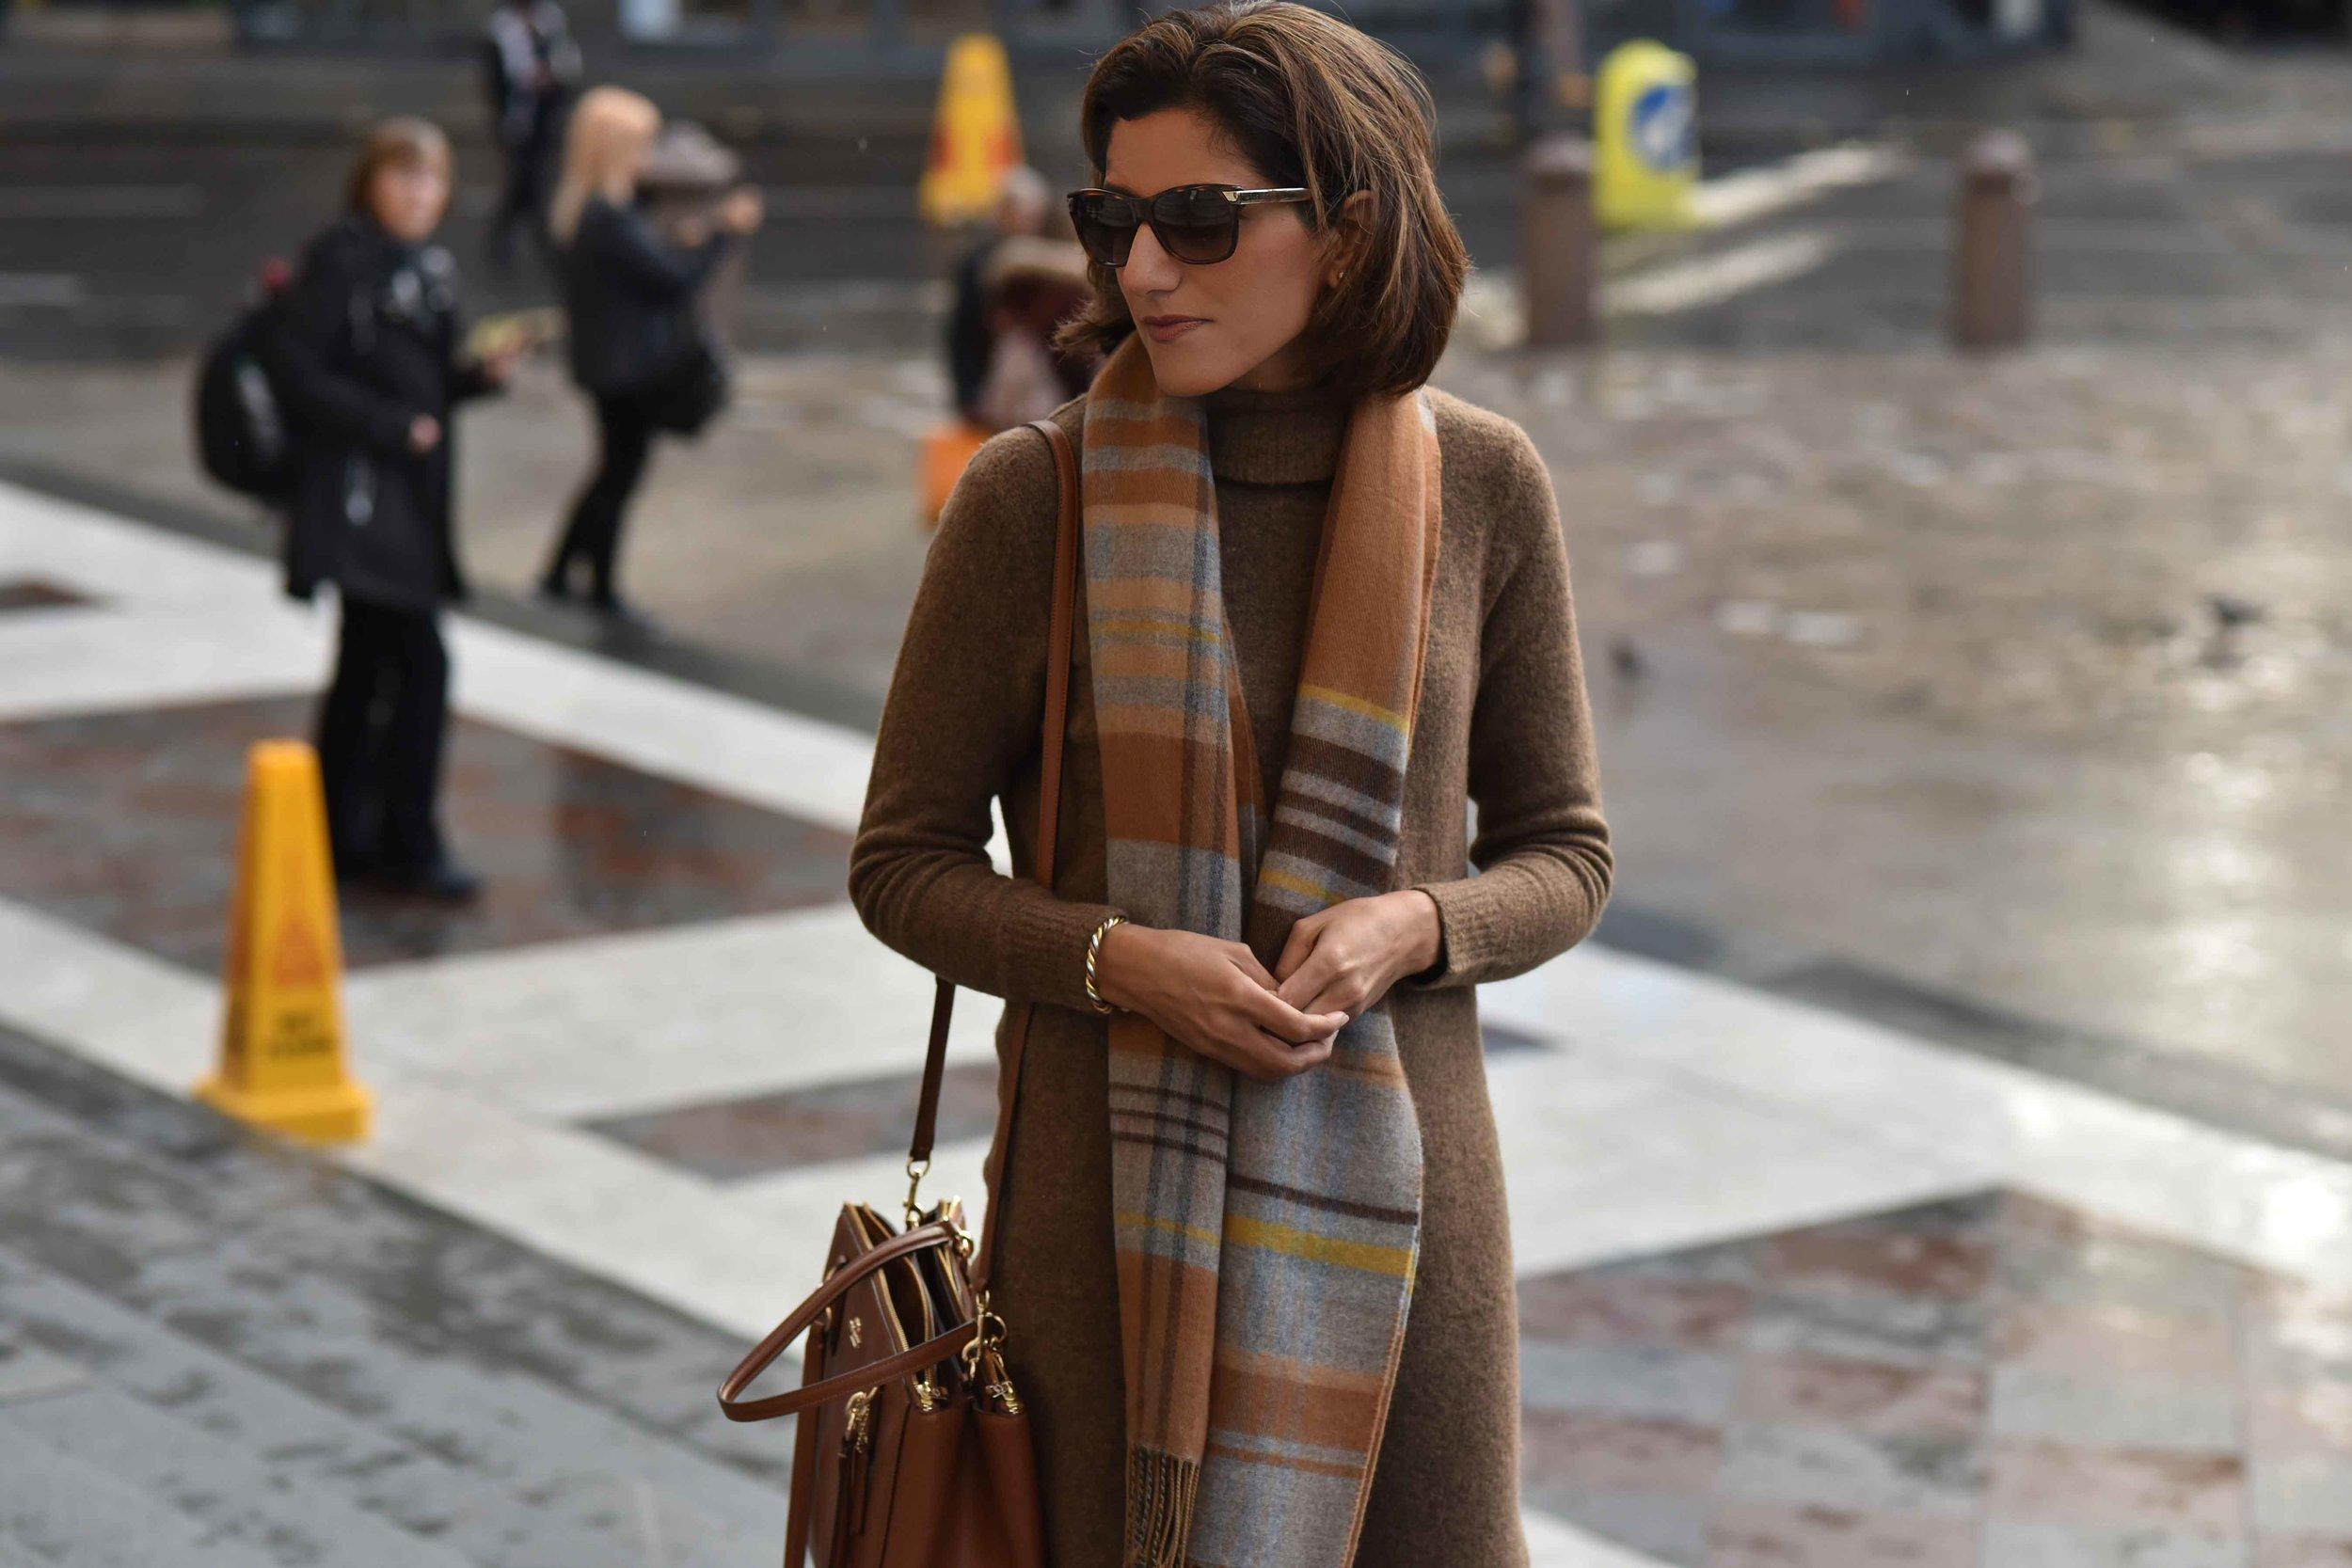 Marks & Spencer sweater dress, Marks & Spencer plaid scarf, Coach handbag, Gucci sunglasses. Photo: Alizeh Latif. Image©sourcingstyle.com.